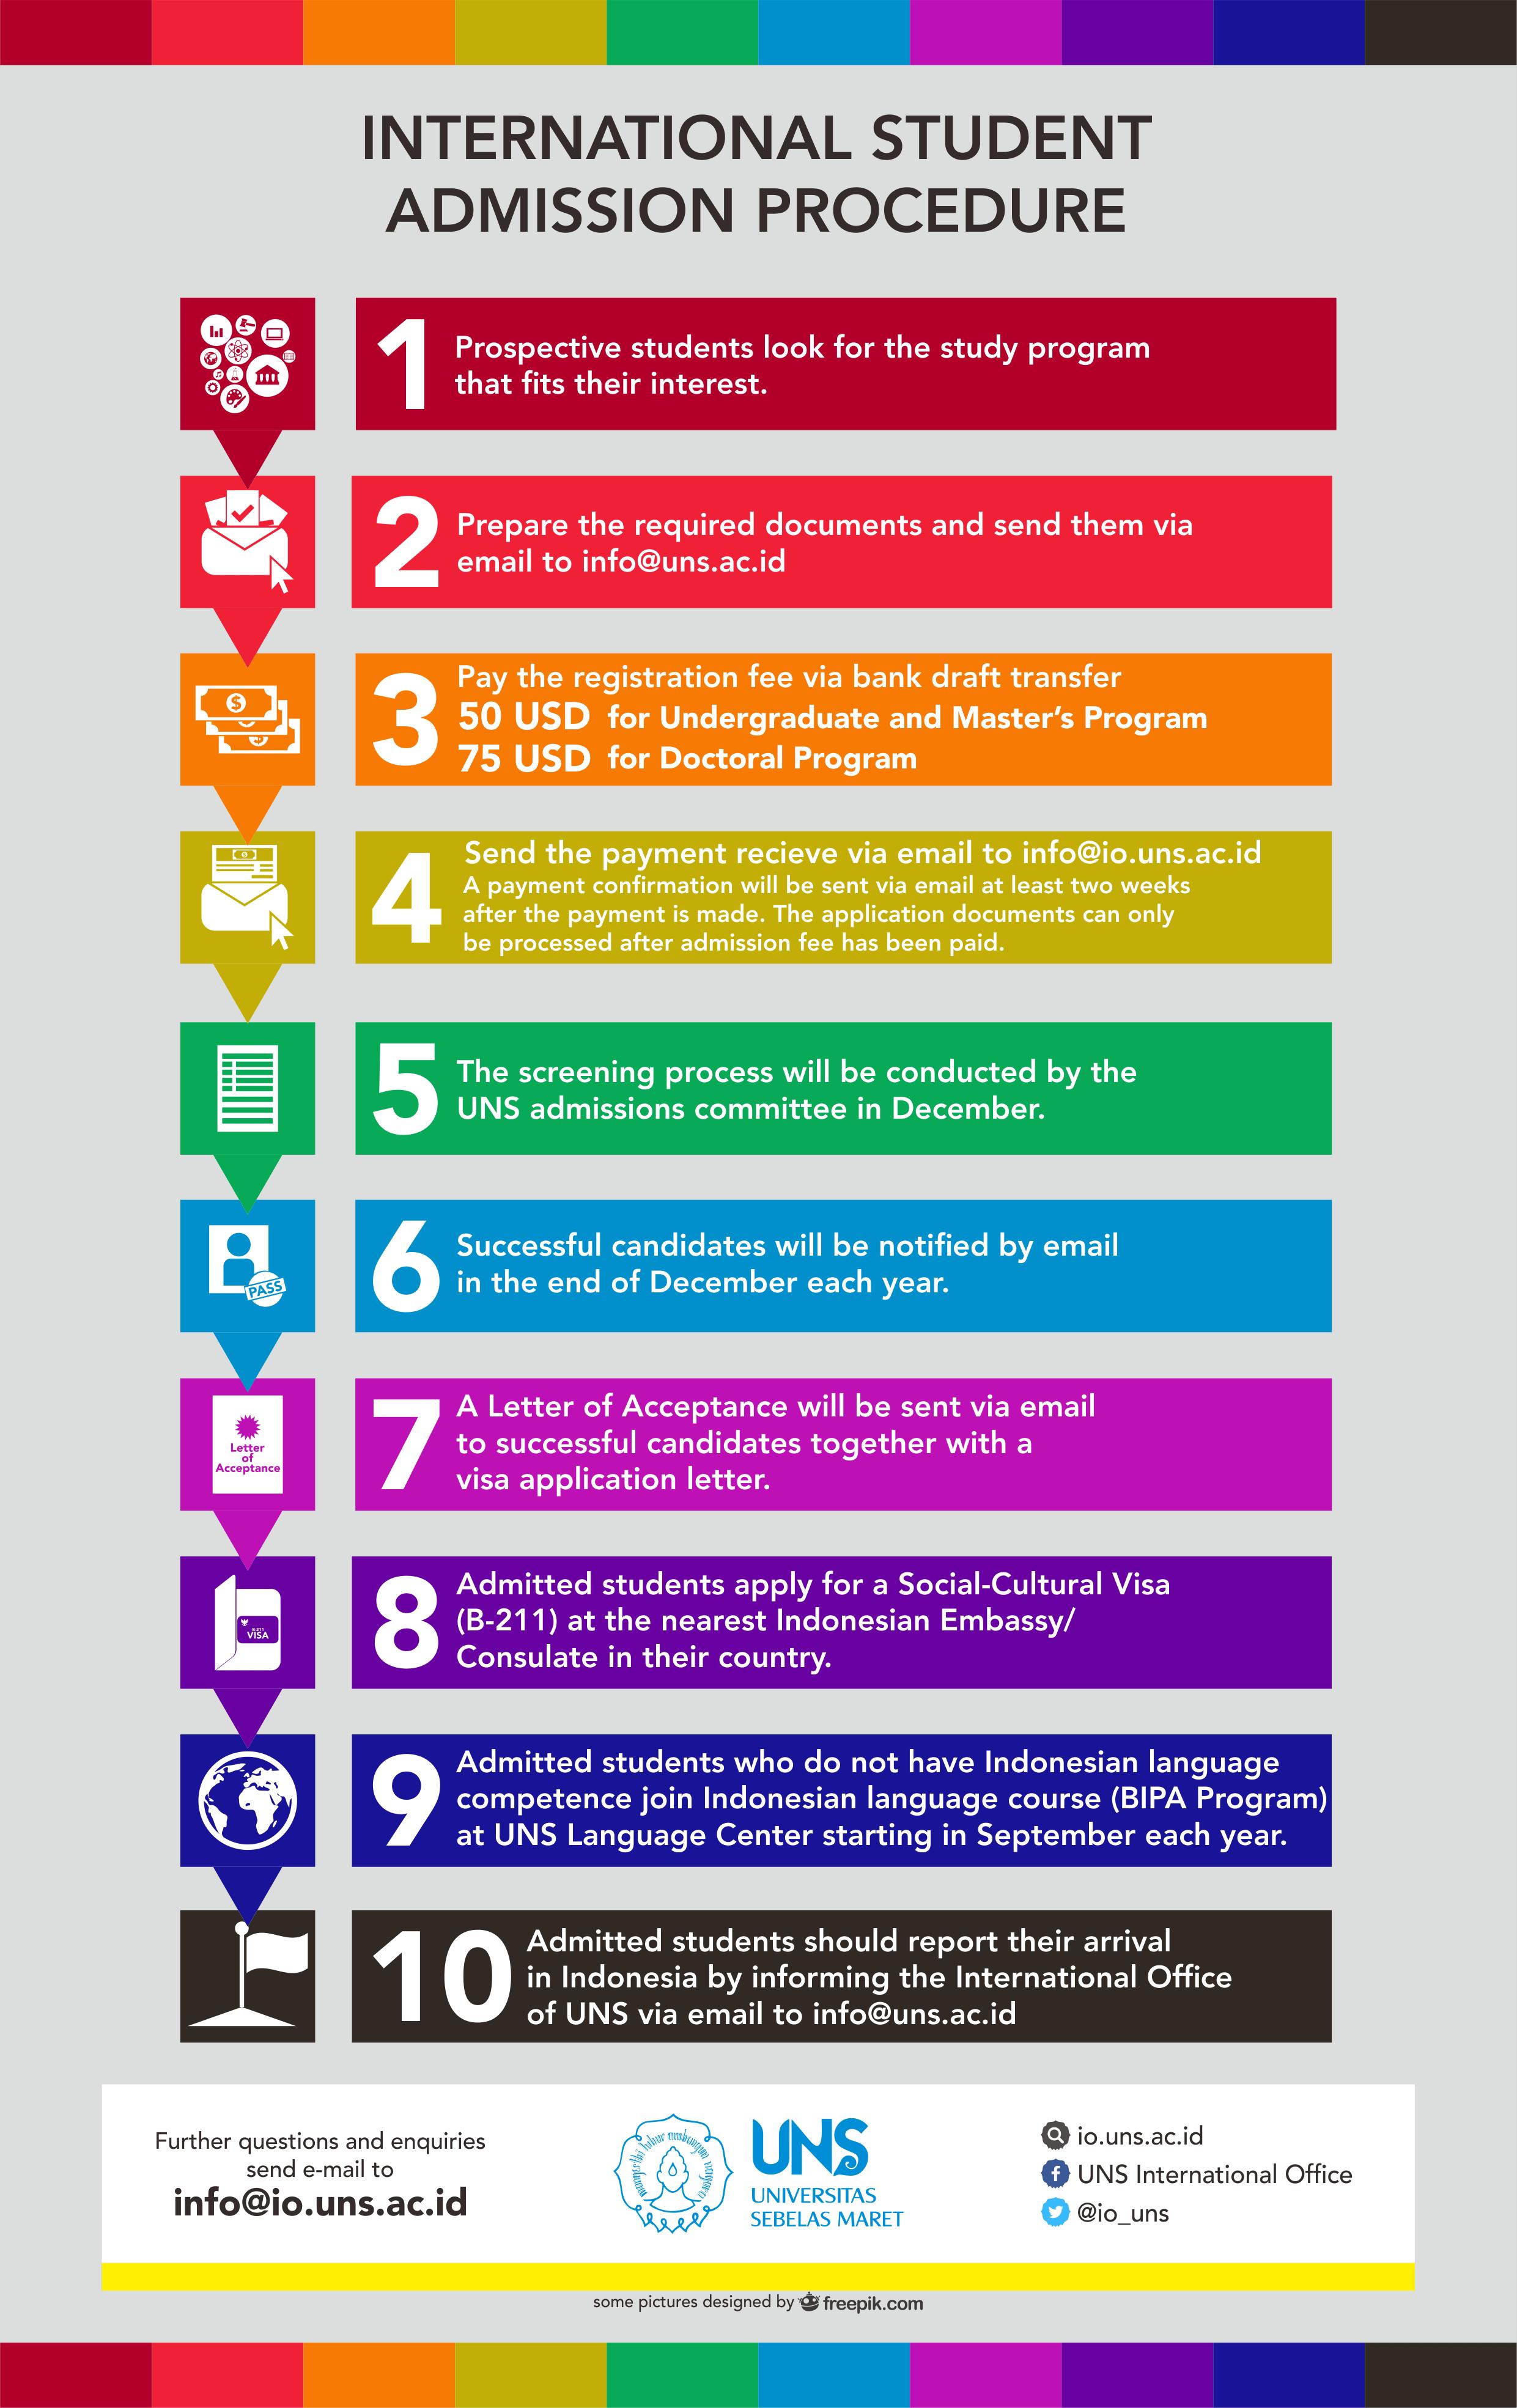 UNS International Student Admission Procedure